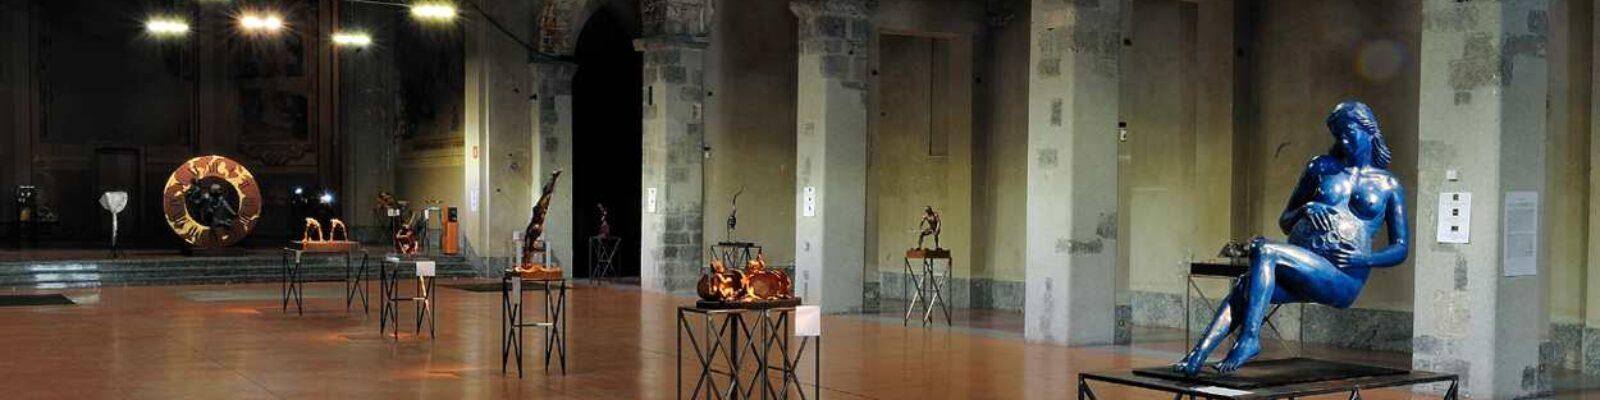 Como Ex St. Francis Church Silvano Bulgari Exhibition - main project view